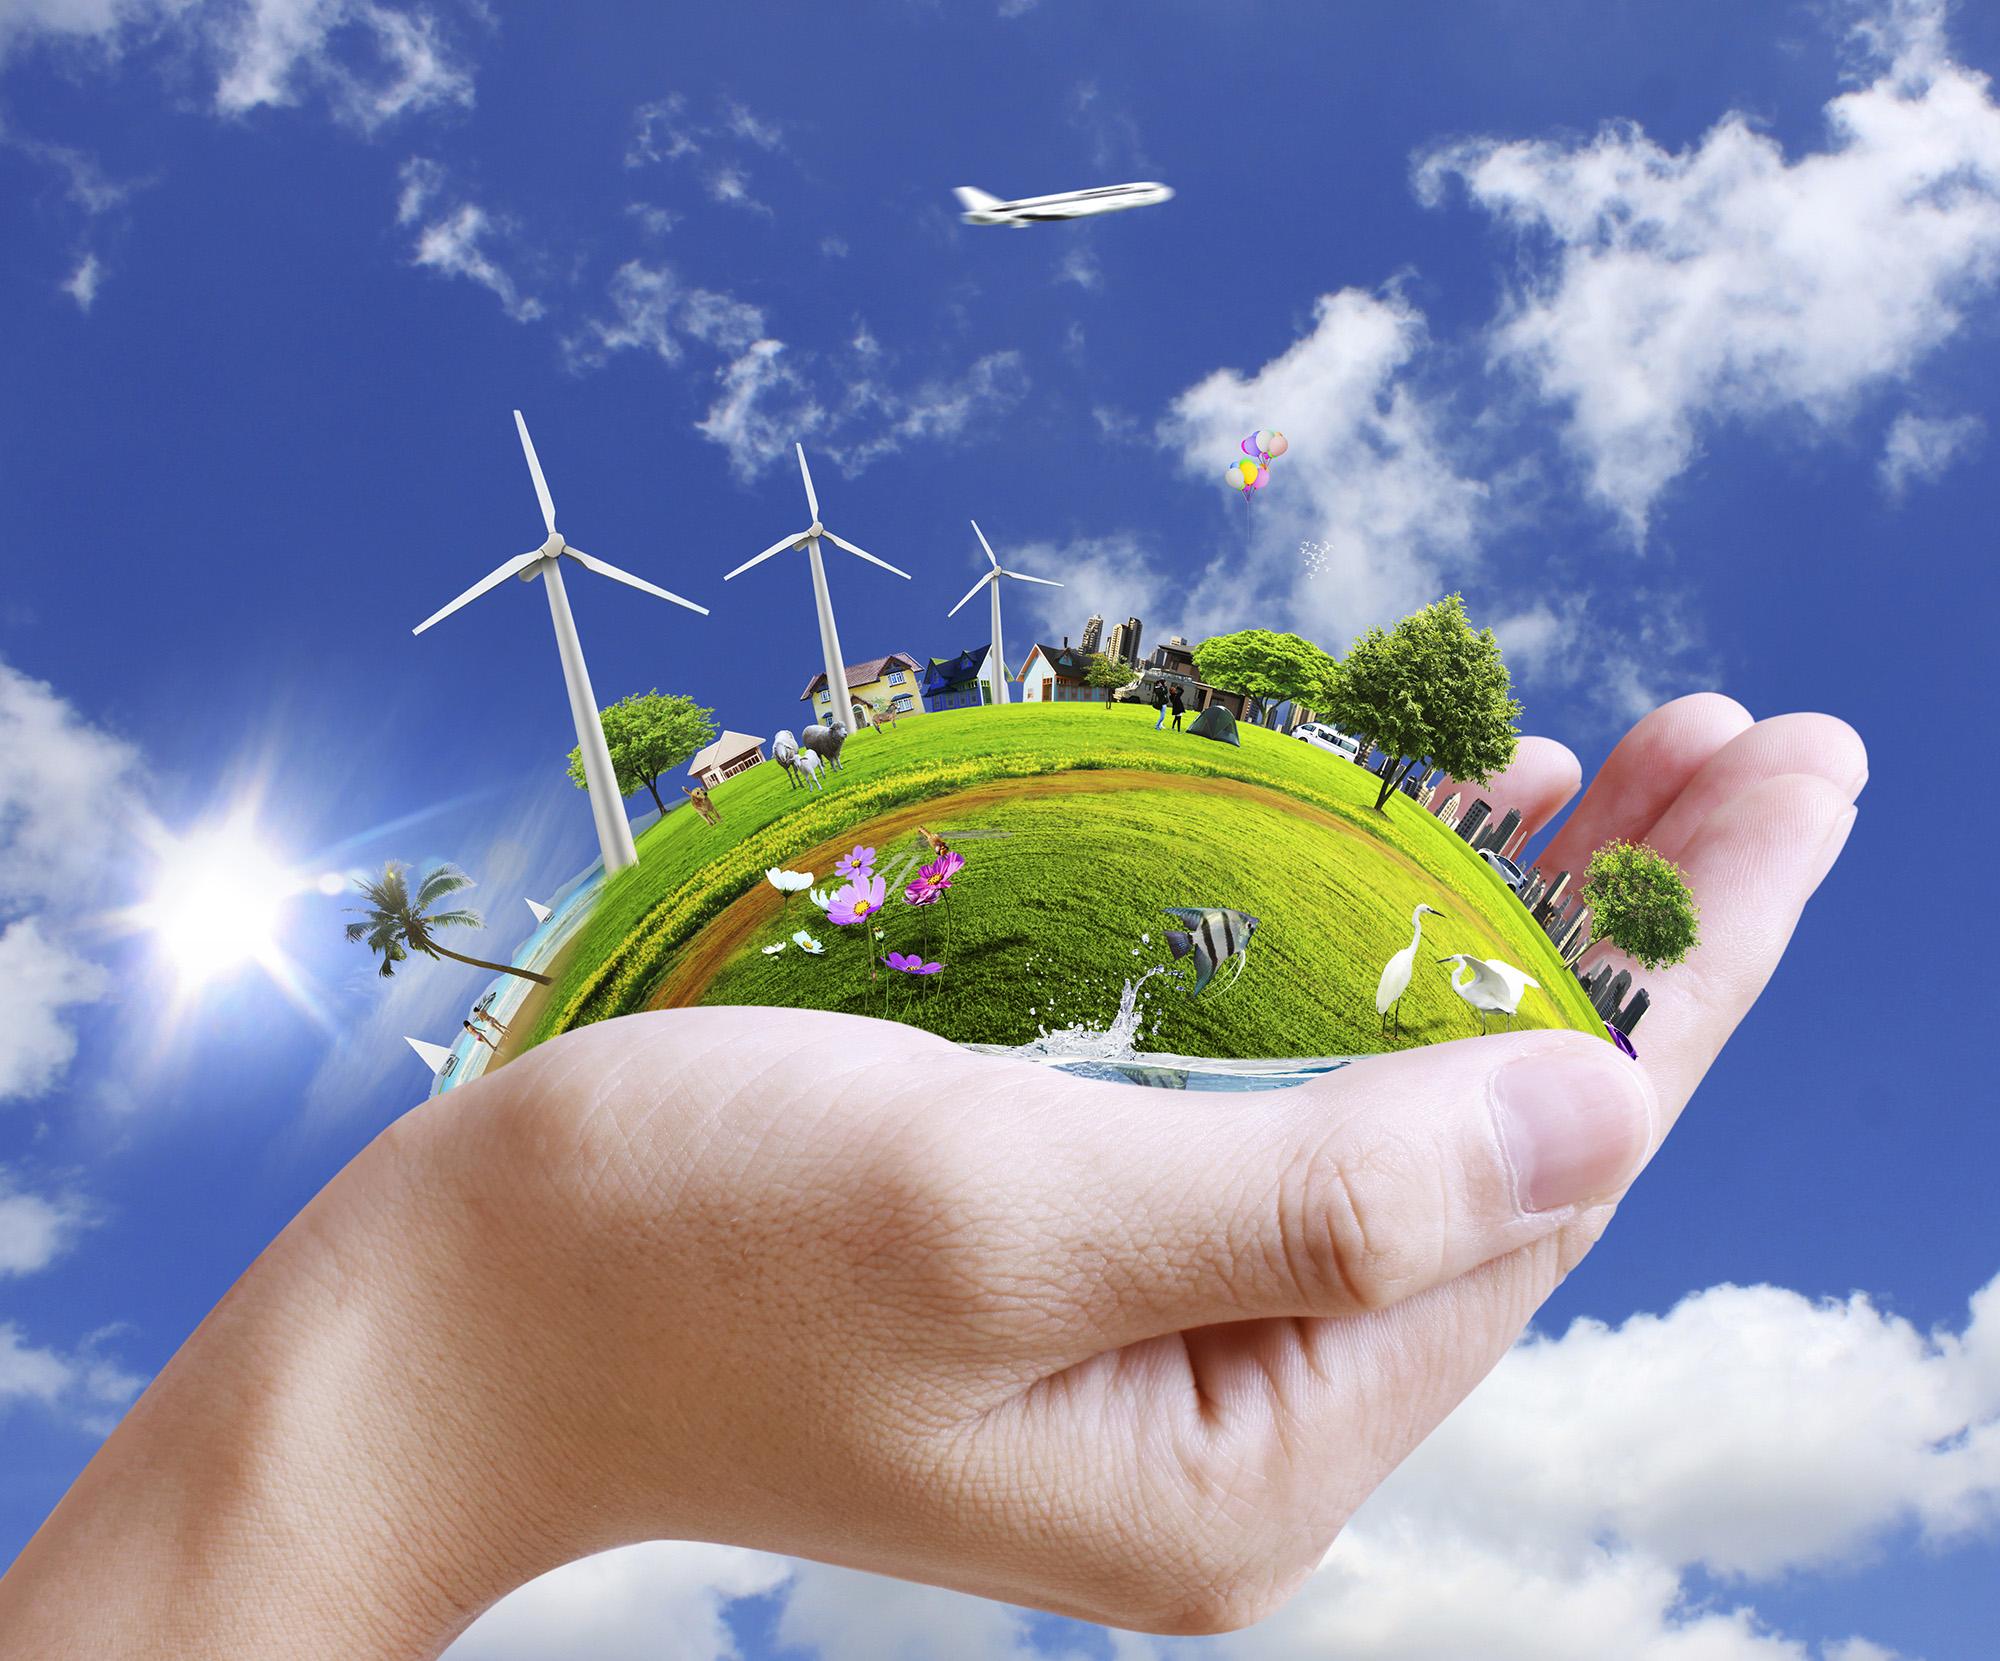 Svak tro på det grønne skiftet i næringslivet | Agder Energi